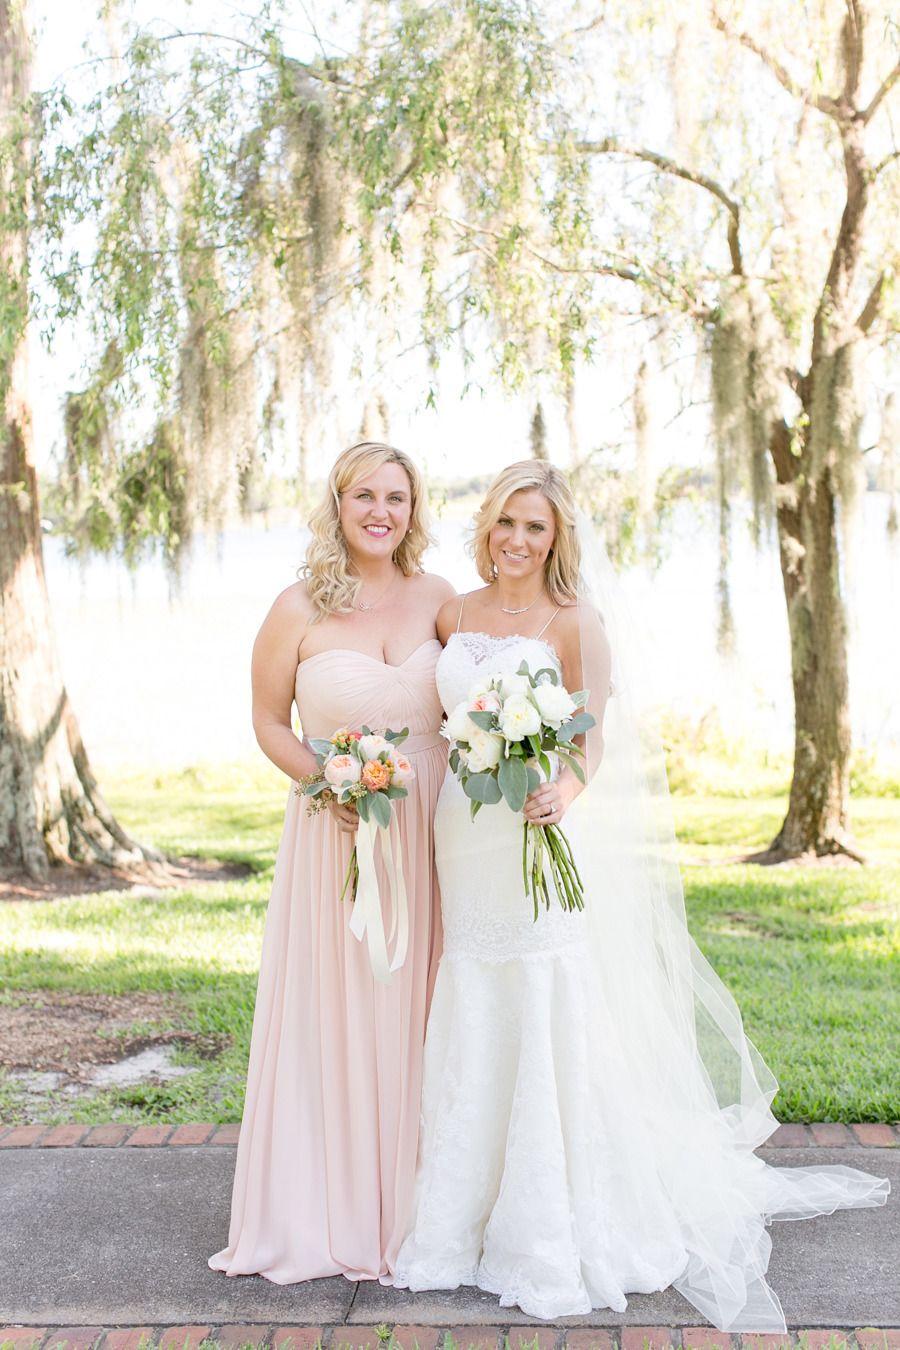 Photography: Amalie Orrange Photography - amalieorrangephotography.com  Read More: http://www.stylemepretty.com/little-black-book-blog/2014/09/18/boho-chic-travel-themed-orlando-wedding/